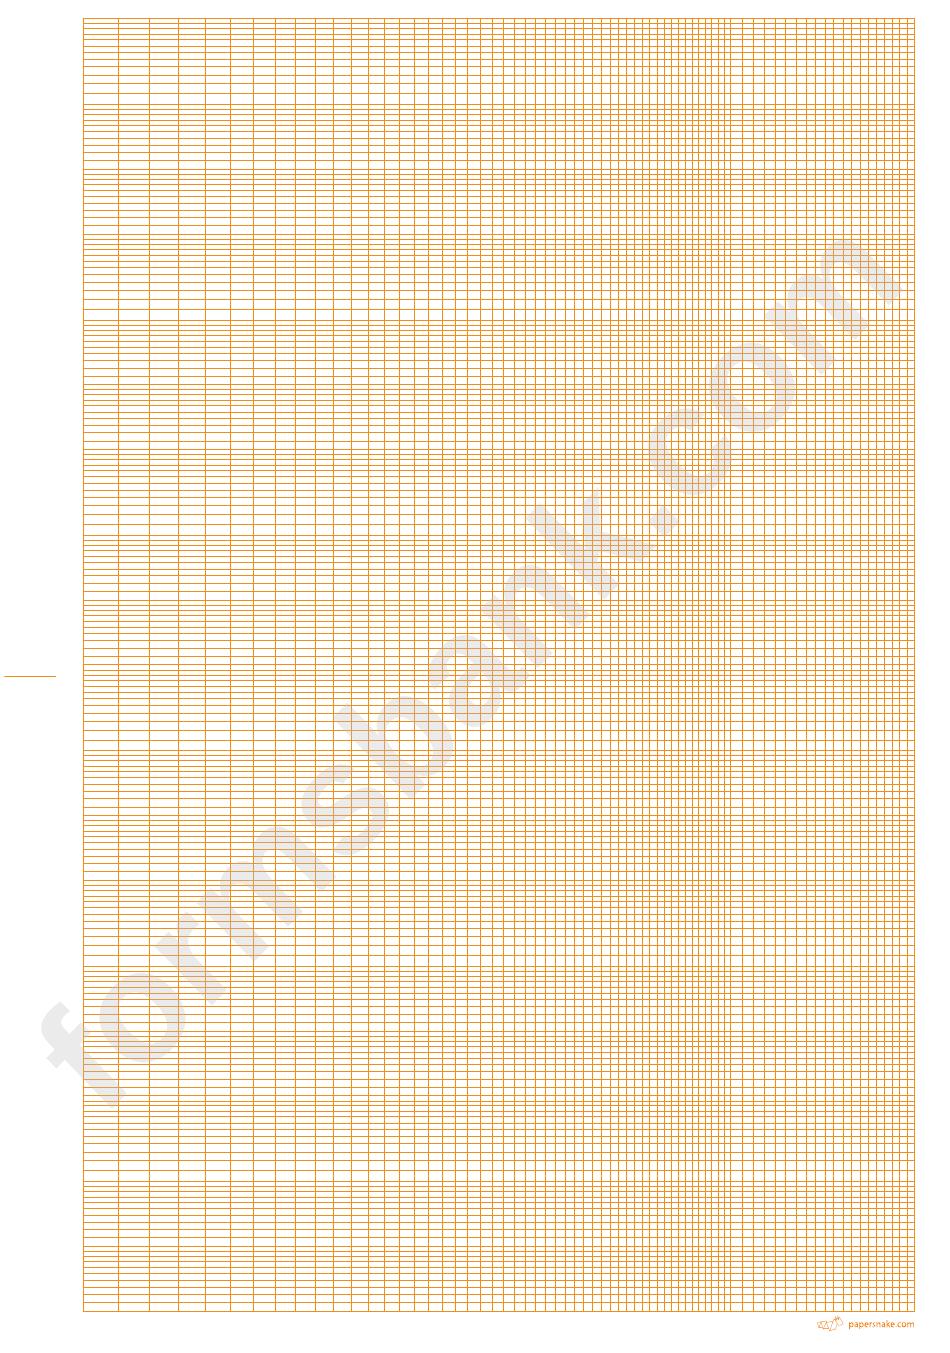 Logarithmic Graph Paper - 6 Decades (Orange On White) printable pdf